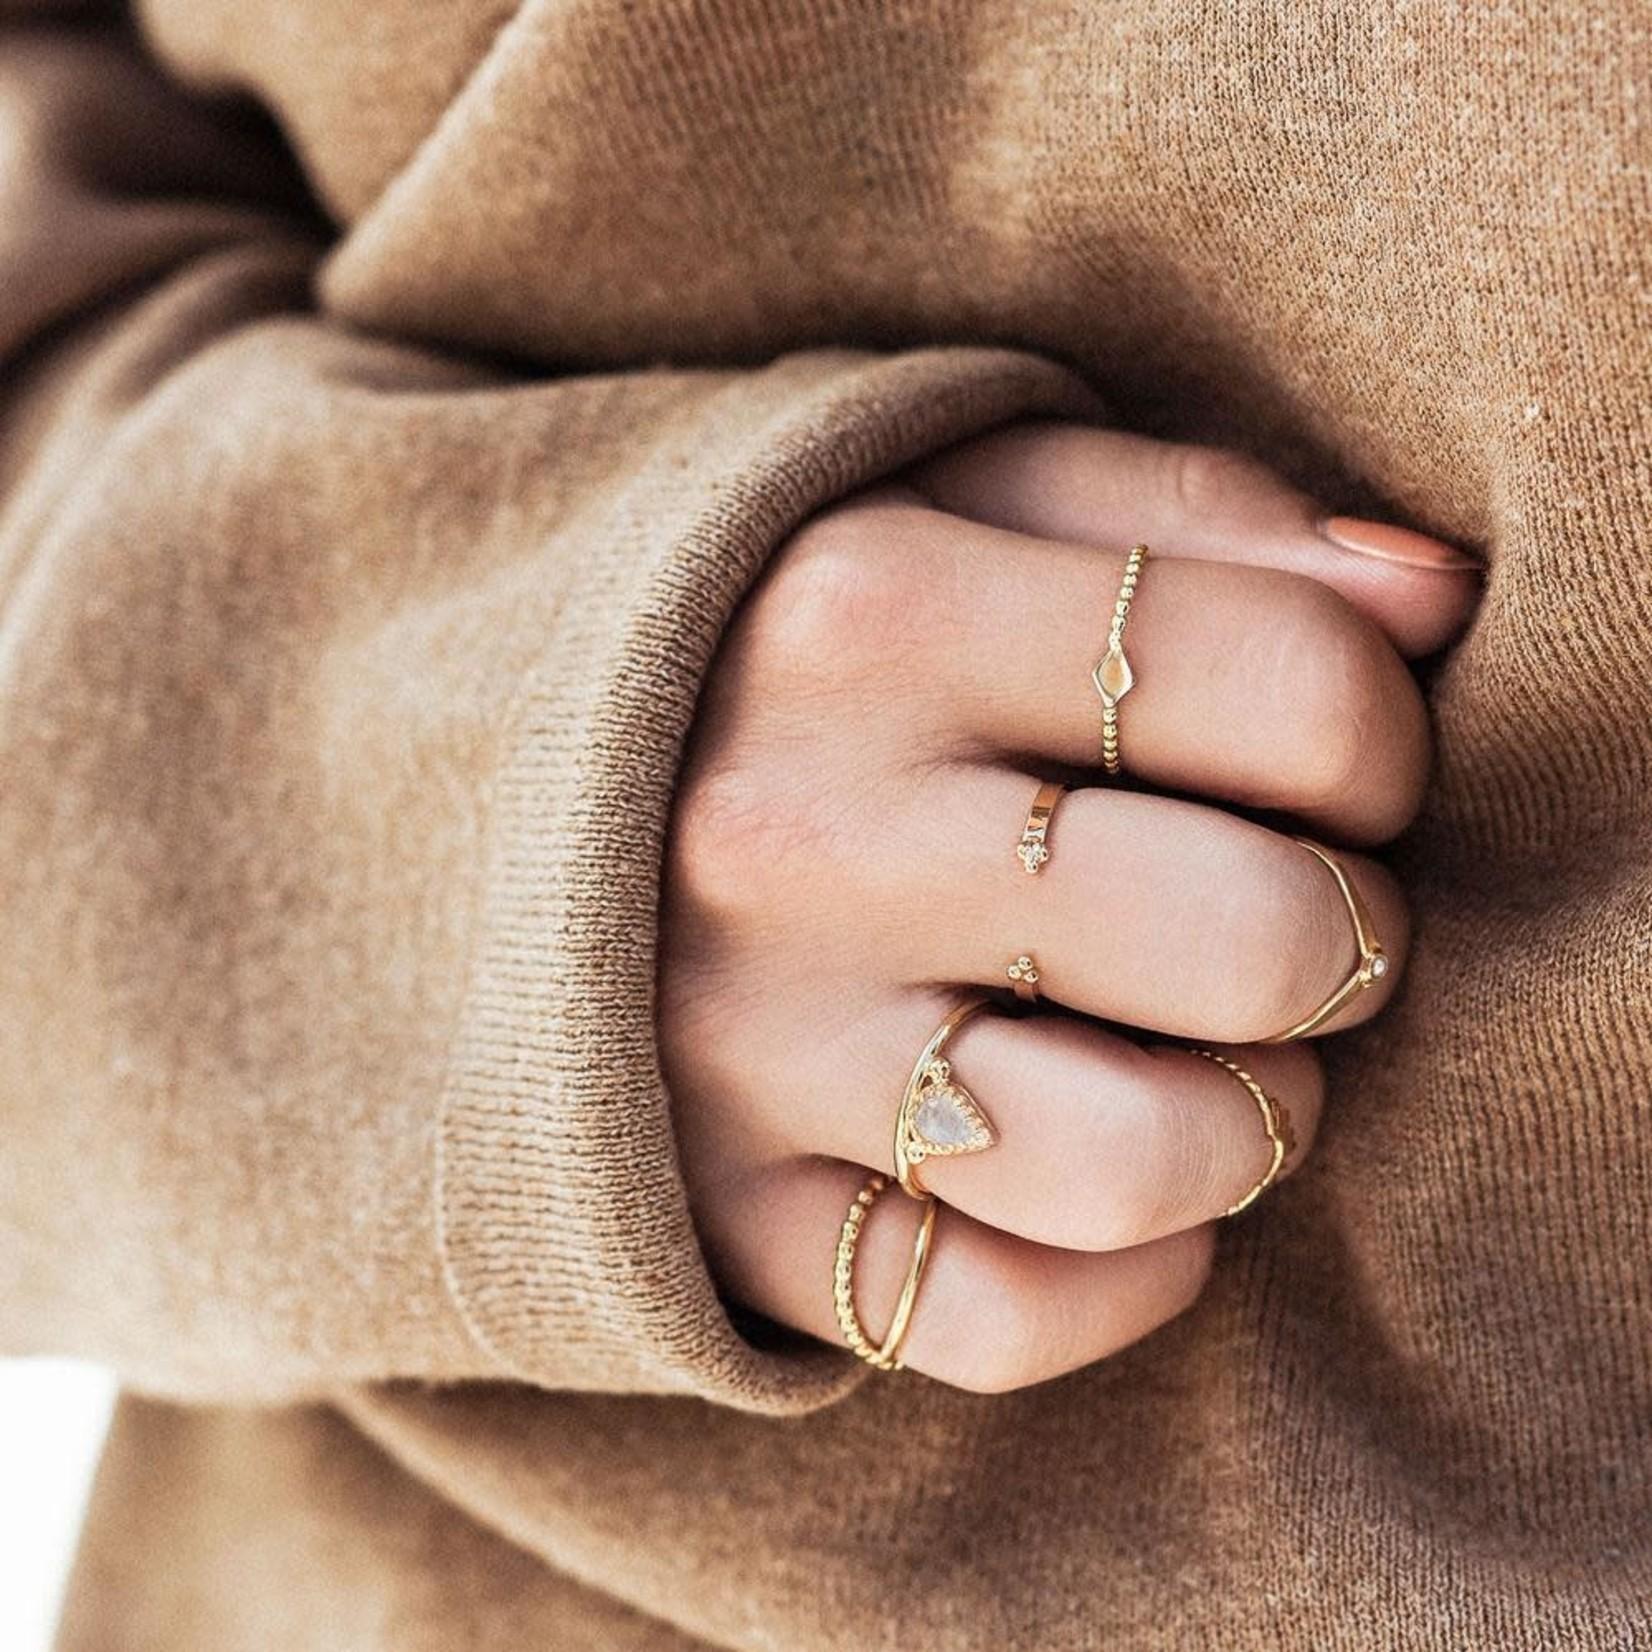 Welldunn jewelry Welldunn bague KITE or